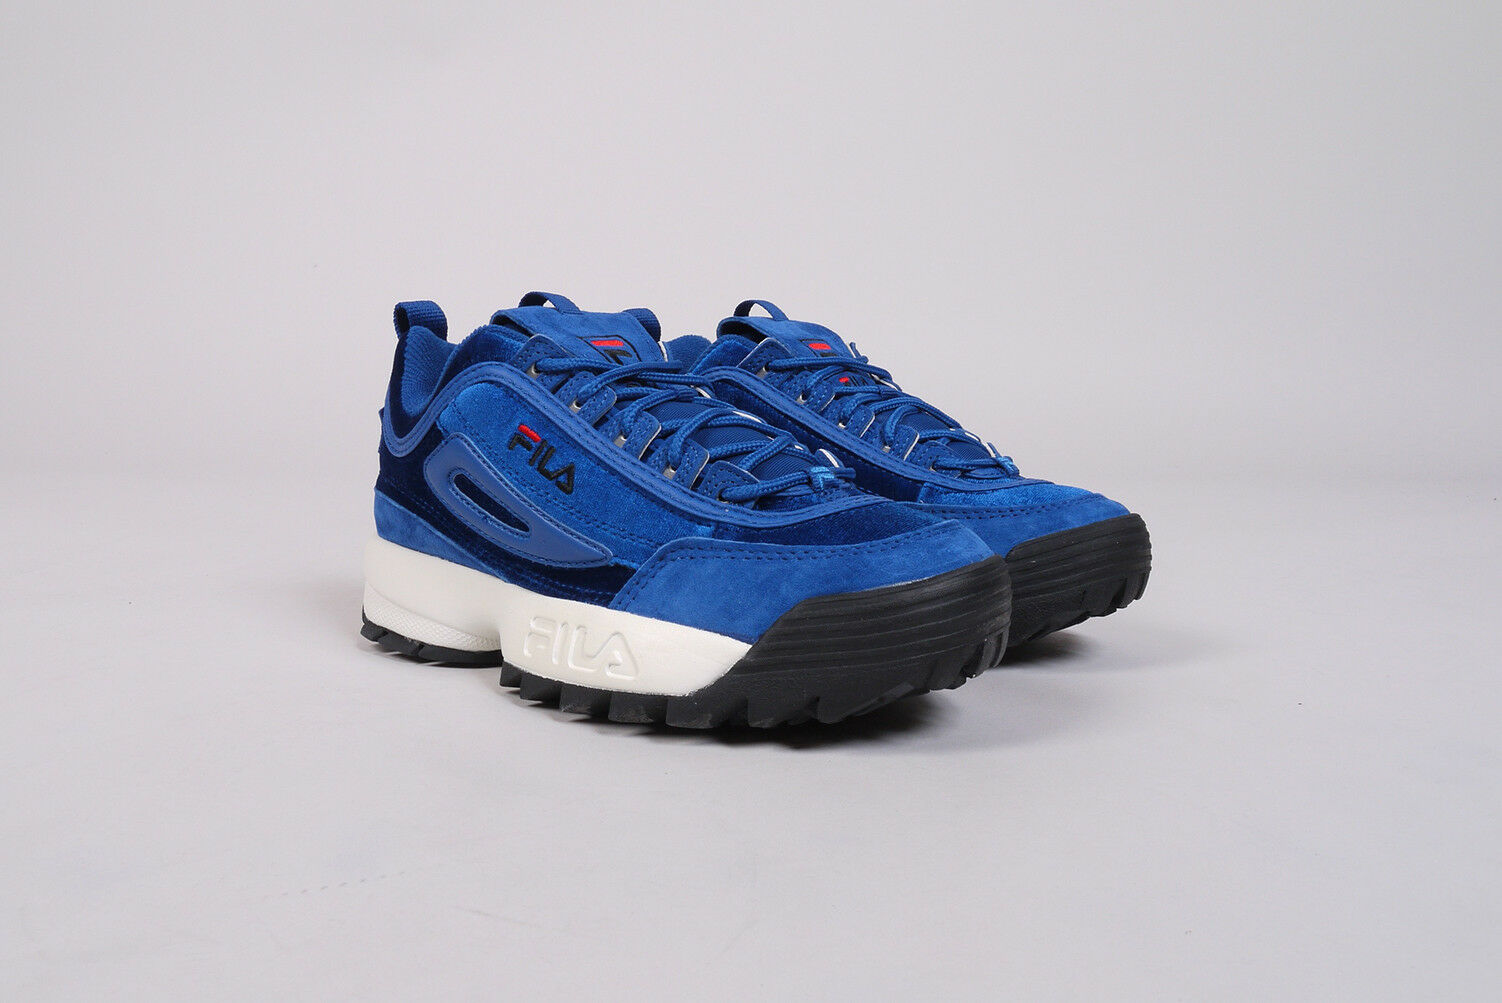 FILA Disruper Low Velvet Wmns  EU 38 scarpe da ginnastica donna scarpe Platform donna  fantastica qualità